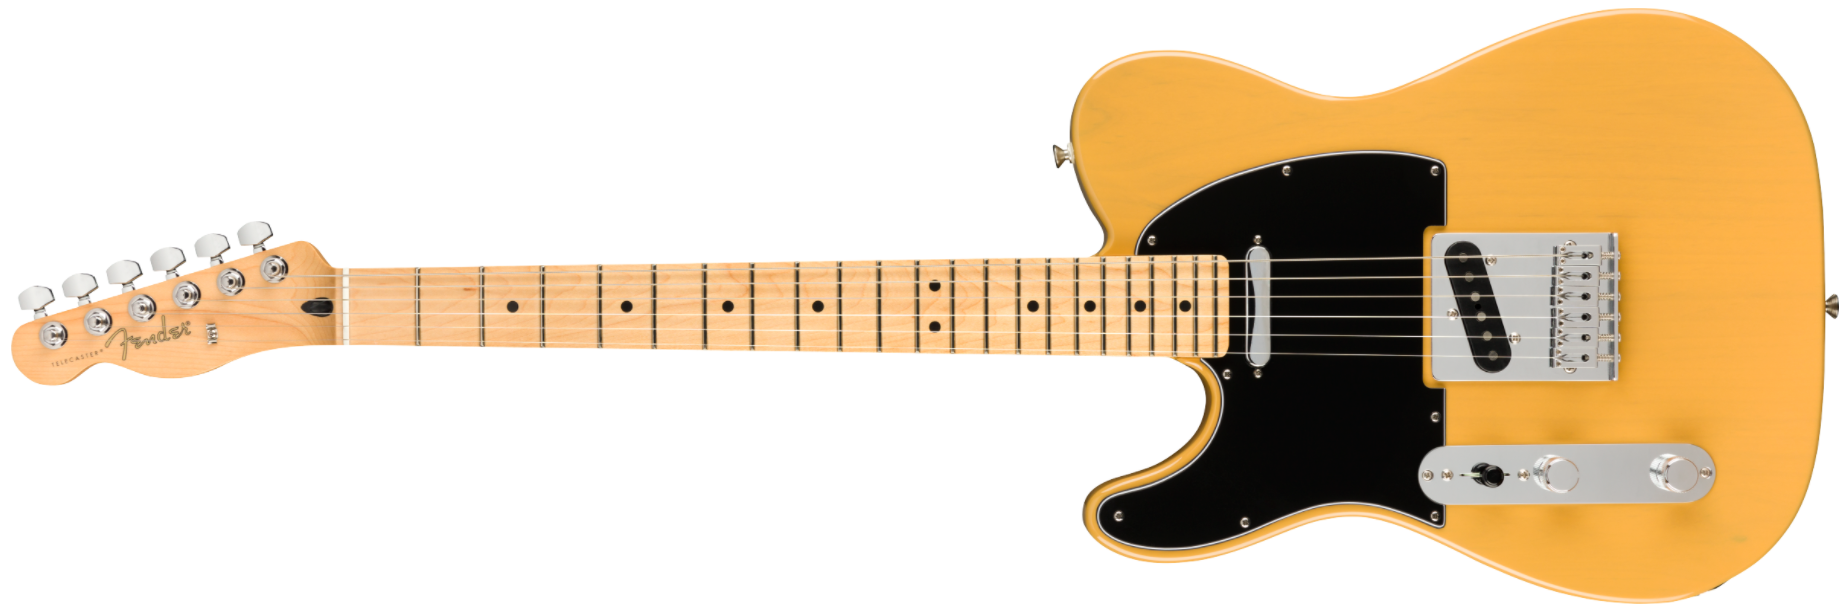 Fender Player Left-handed Telecaster, MN, Butterscotch Blonde